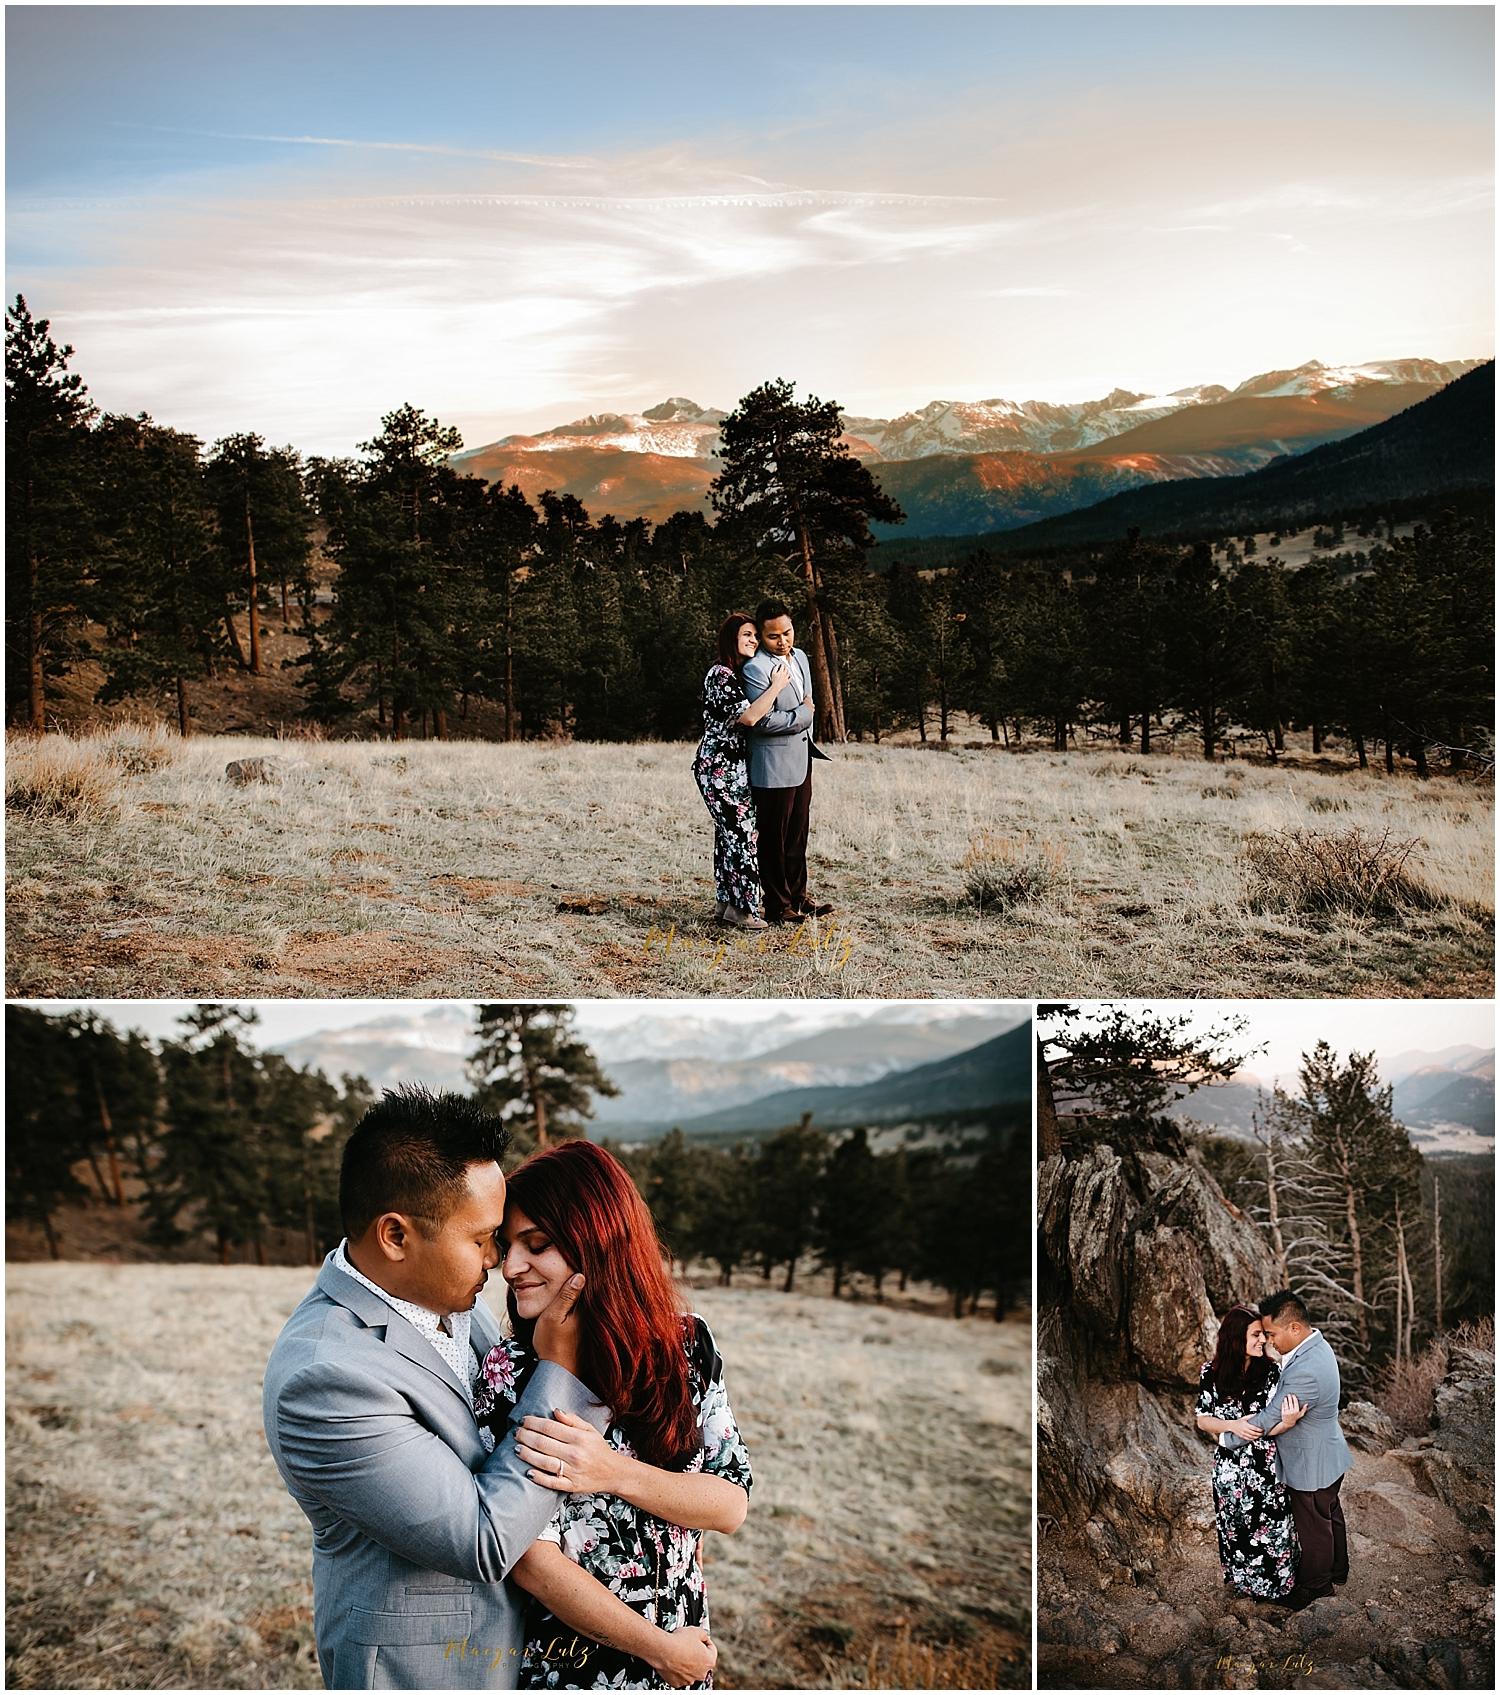 Destination-engagement-wedding-photographer-Colorado-Rocky-Mountain-National-Park-Session_0047.jpg